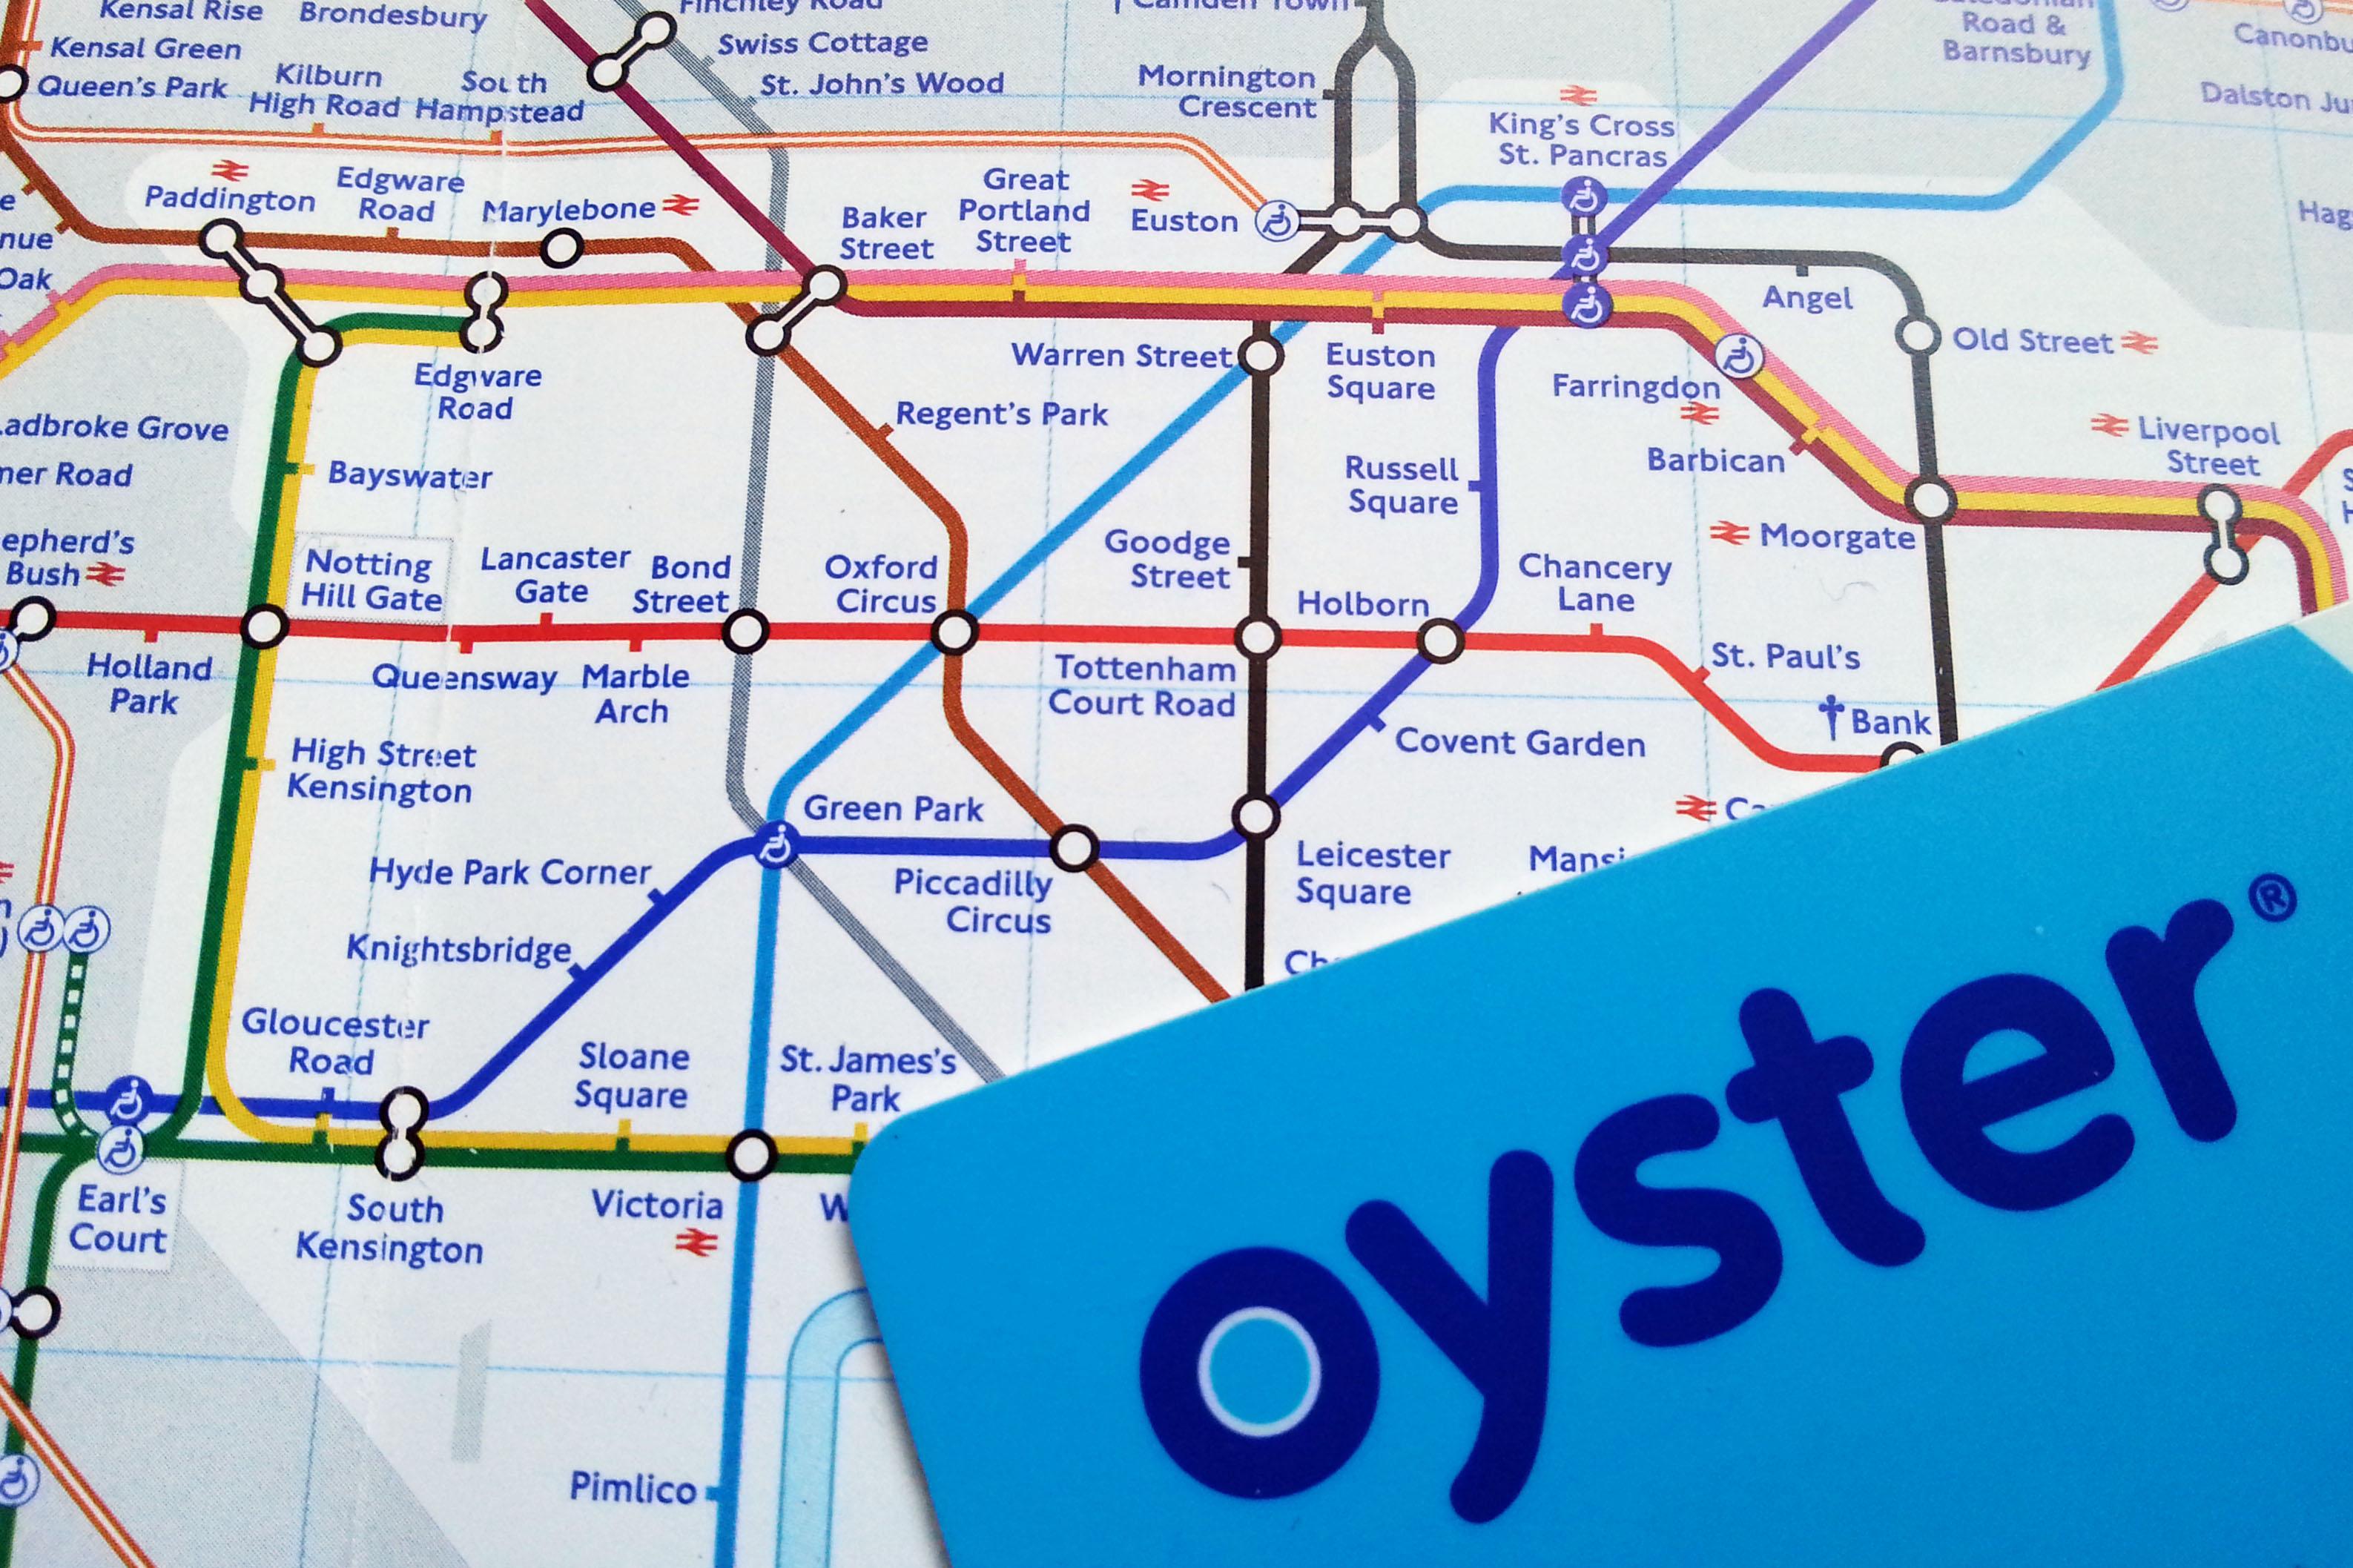 oyster metro tube map zonas tarifas precio diario londinense